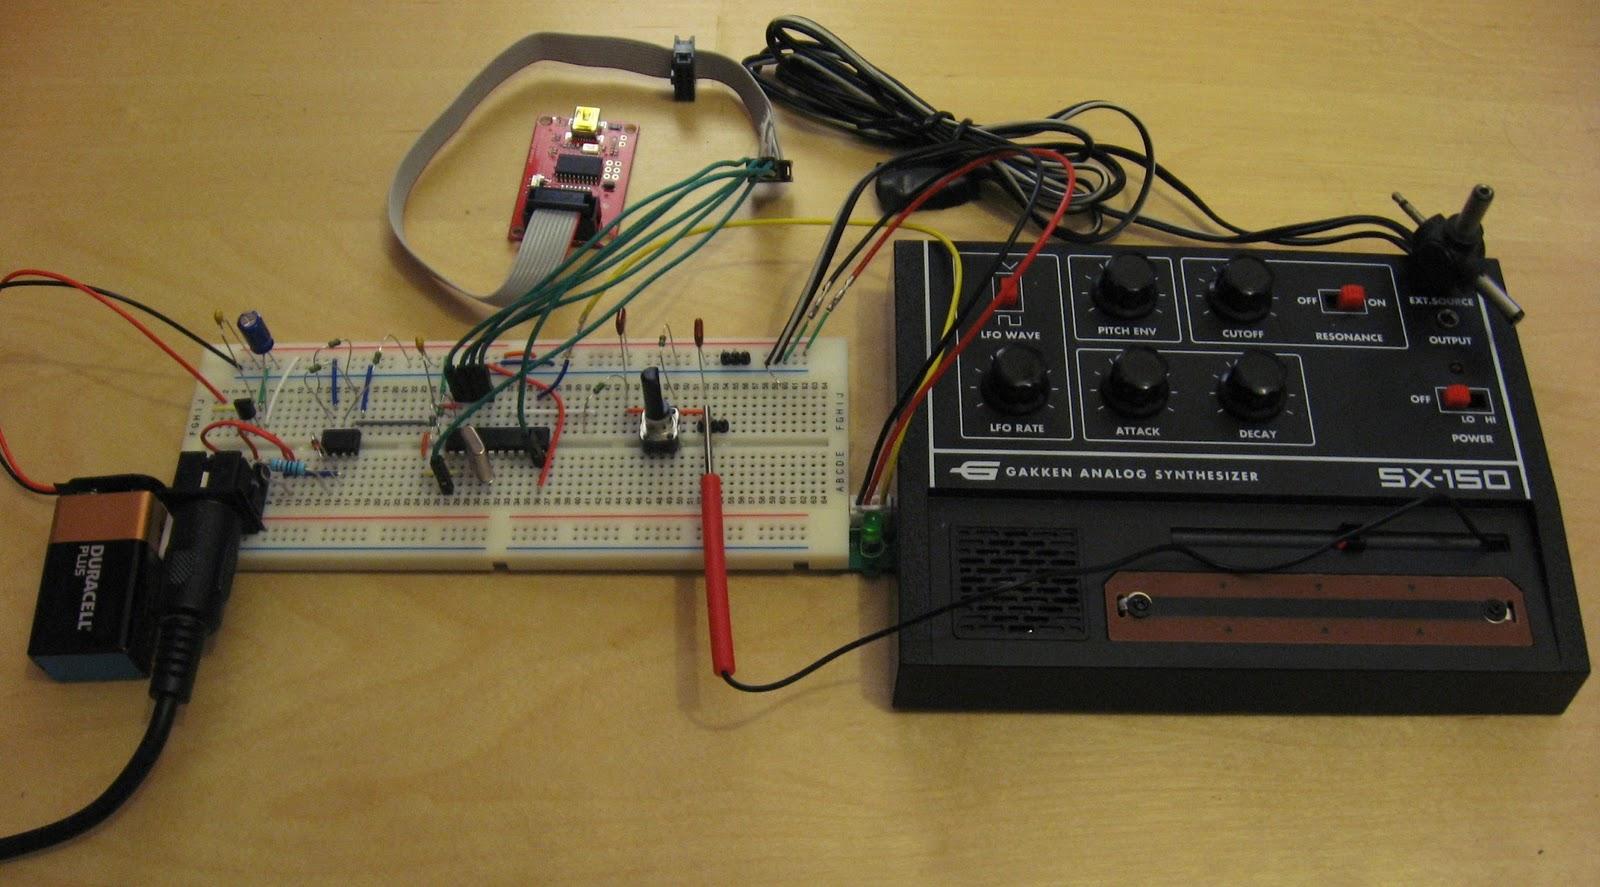 Analog Build Music Things Diy Voltagecontrolled Amplifier Hackme Gakken Sx 150 Midi Interface